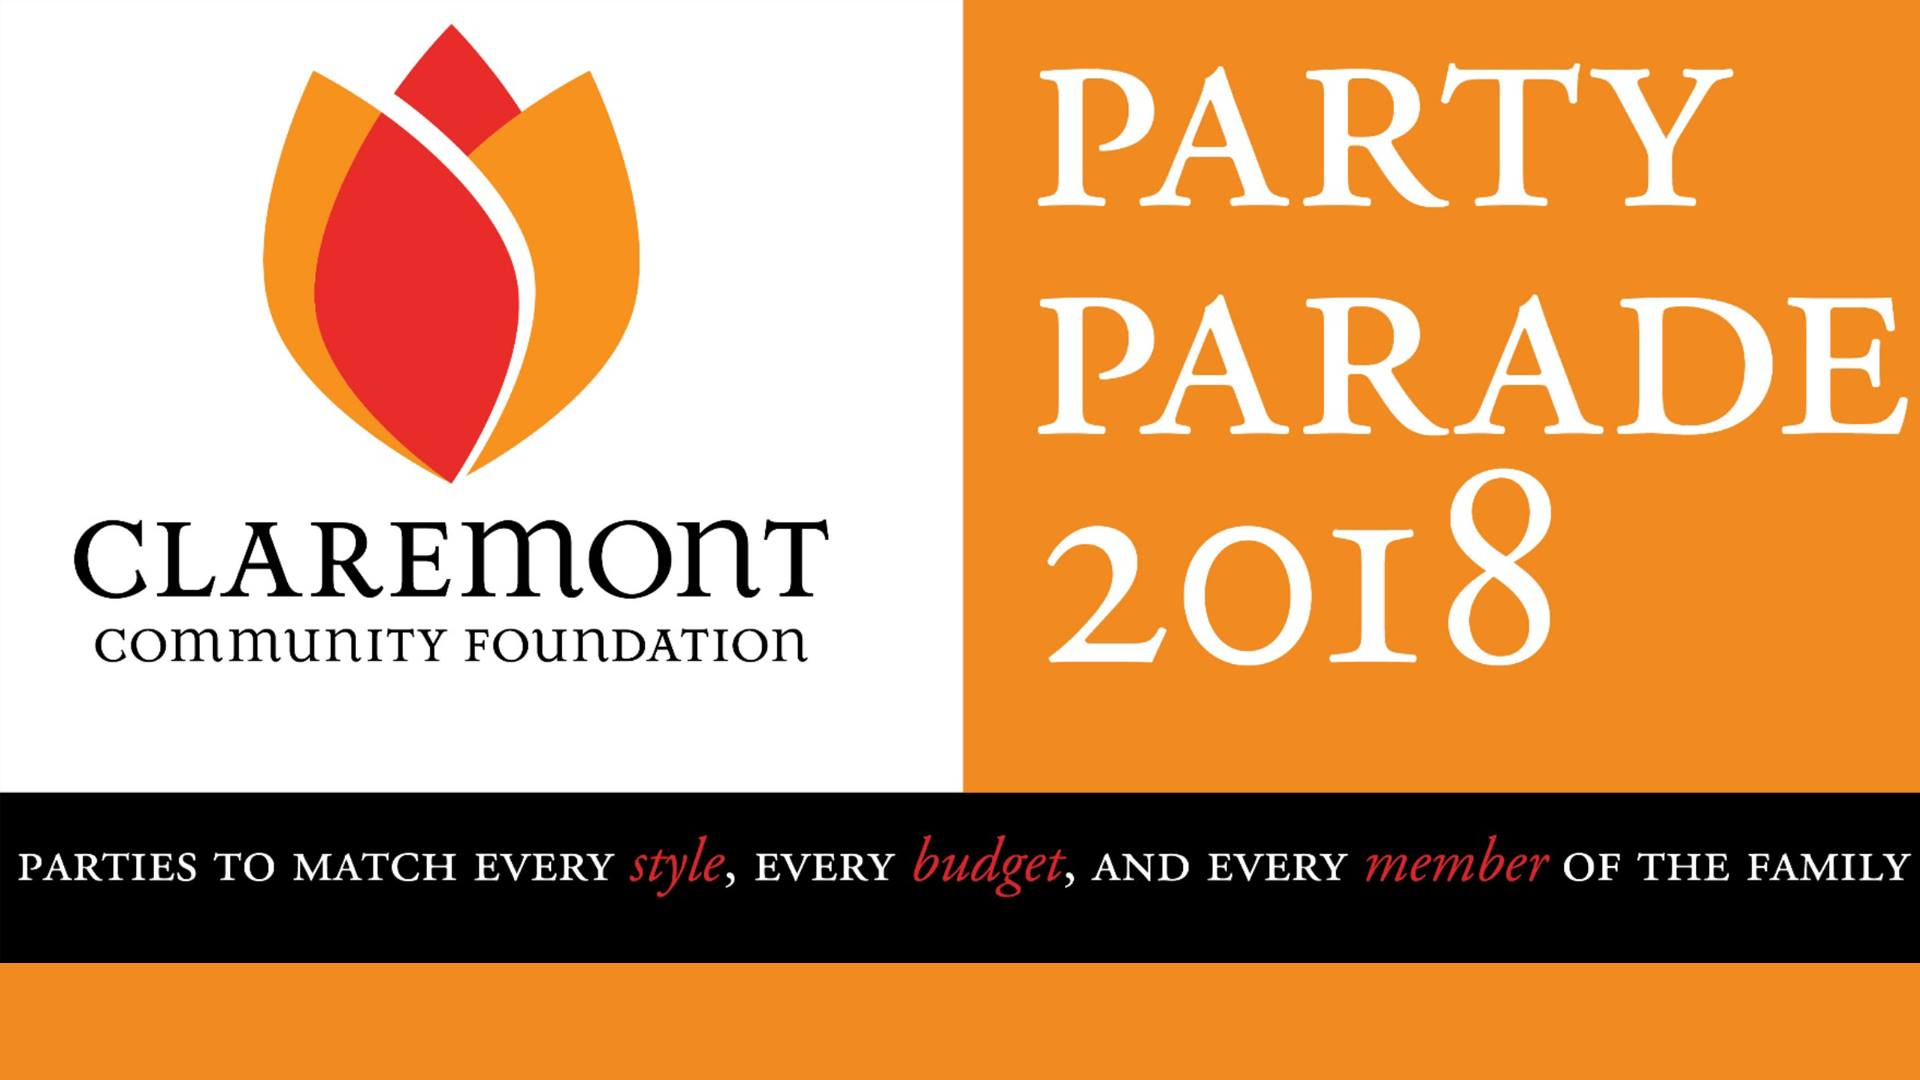 party parade im